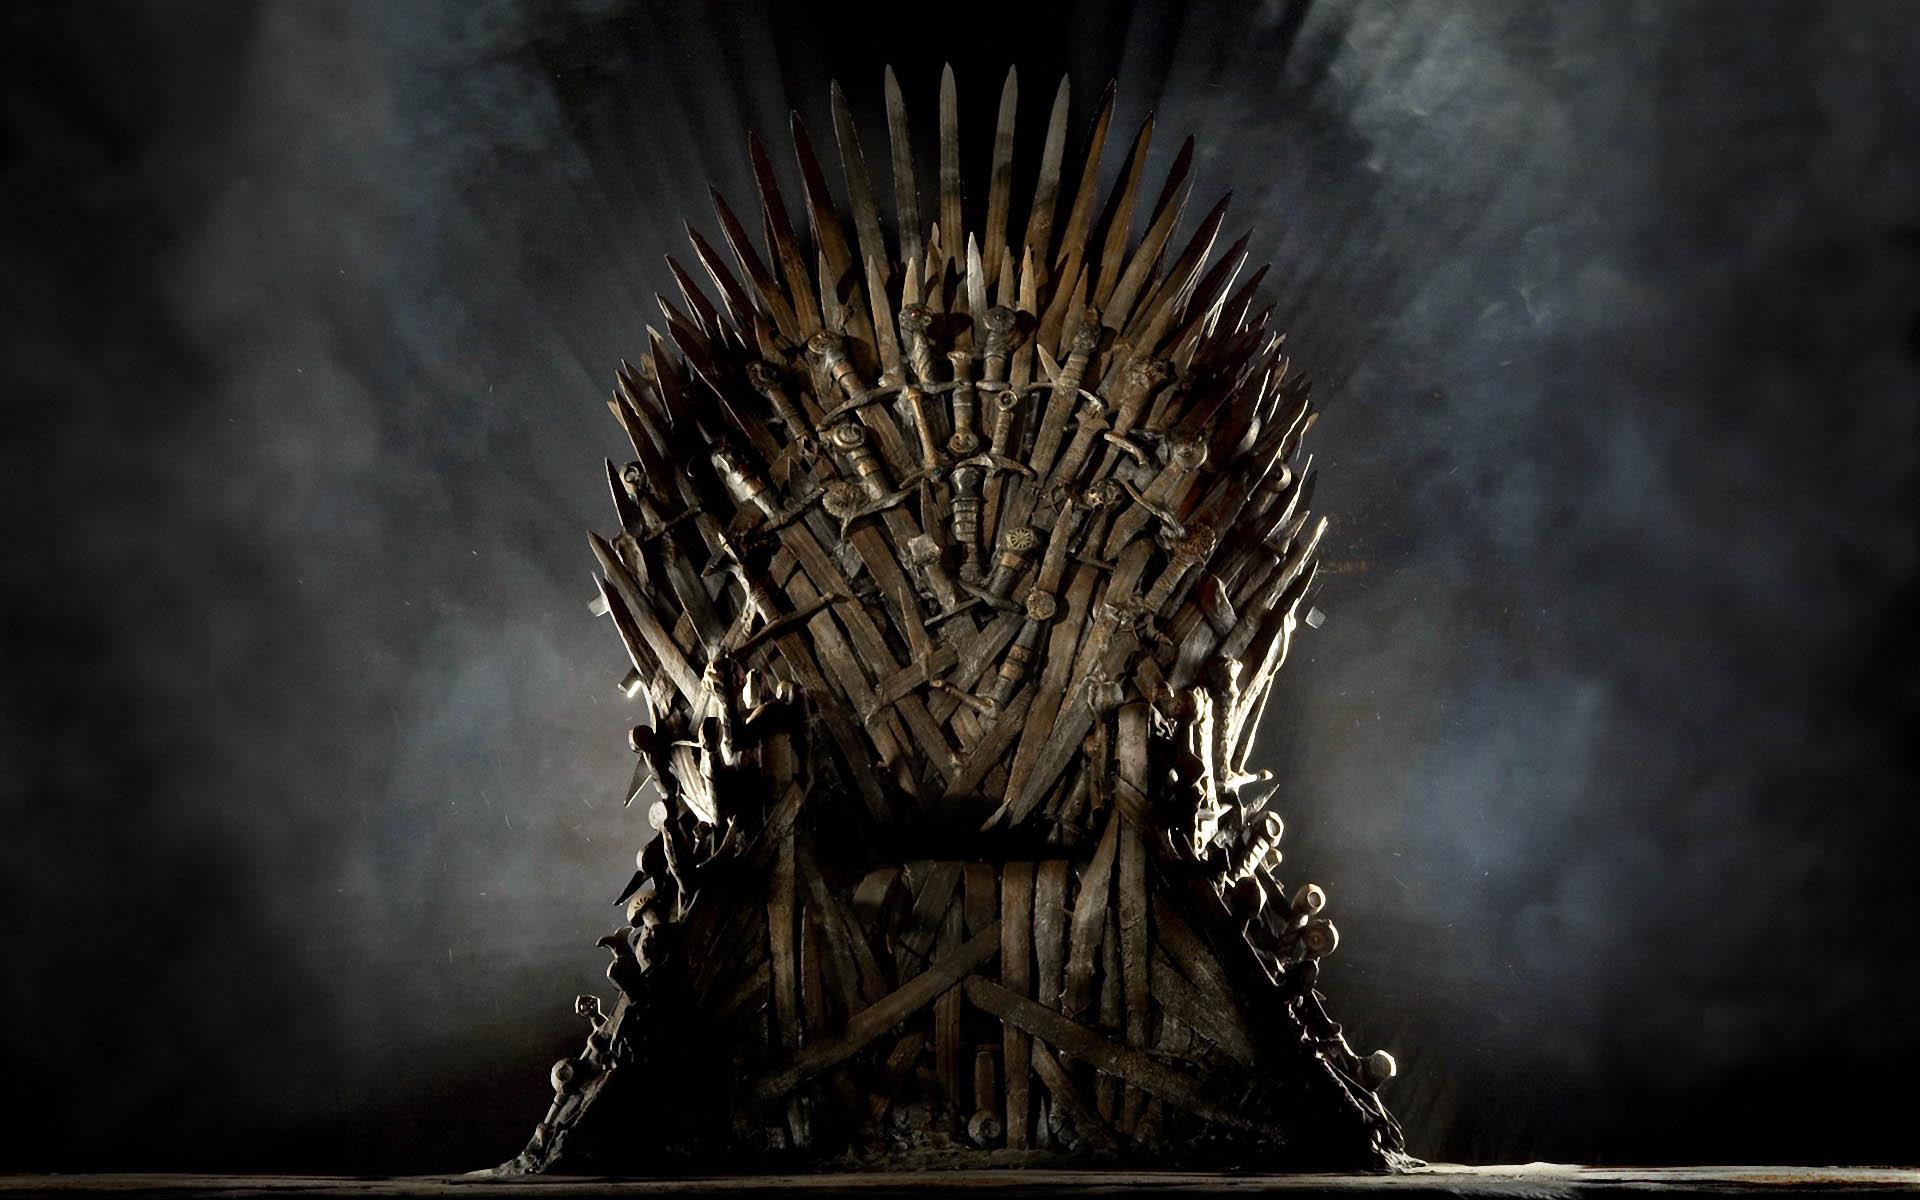 Nuevos teasers de GoT revelan un mal futuro para los Stark, Lannister y Targaryen